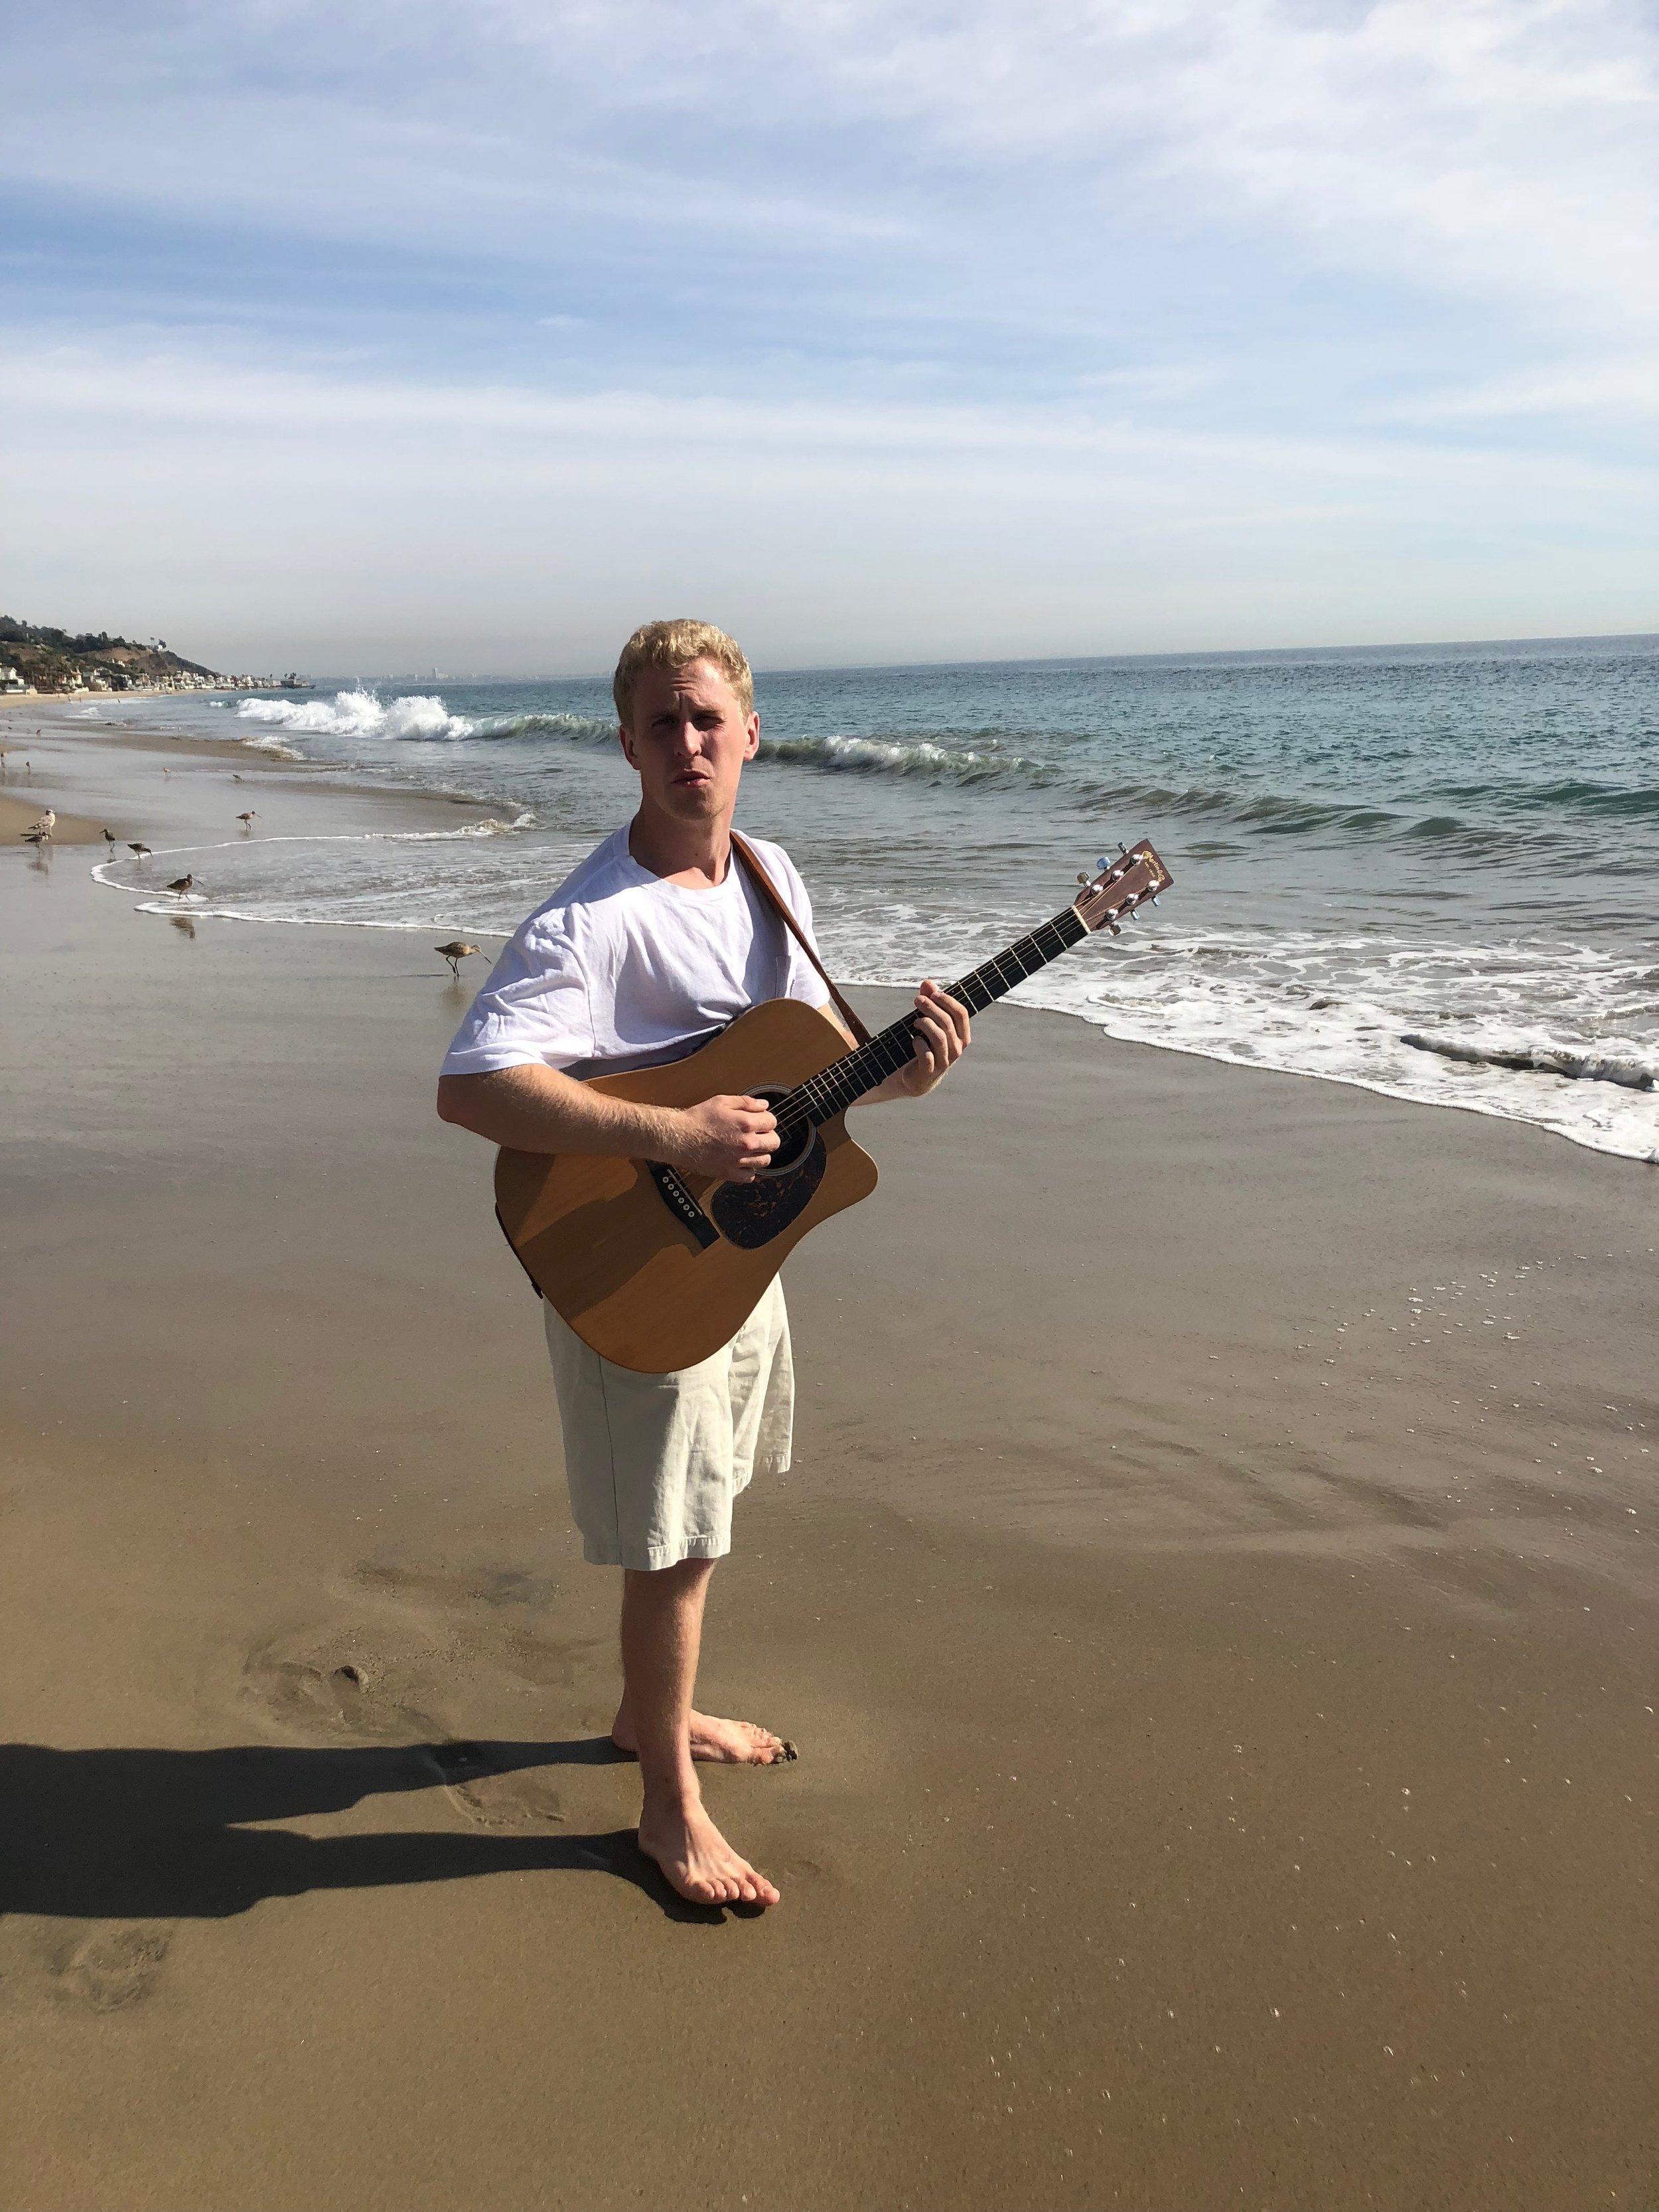 max-mccali-music-maxmccali-musician-guitarist-guitarplayer-recordingartist-singersongwriter-musicproducer-singer-songwriter-countrymusic-popmusic-edm-dancemusic-tropicalhousemusic-newmusic-recordingstudio-beach-malibu-guitar-style-happiness.JPG